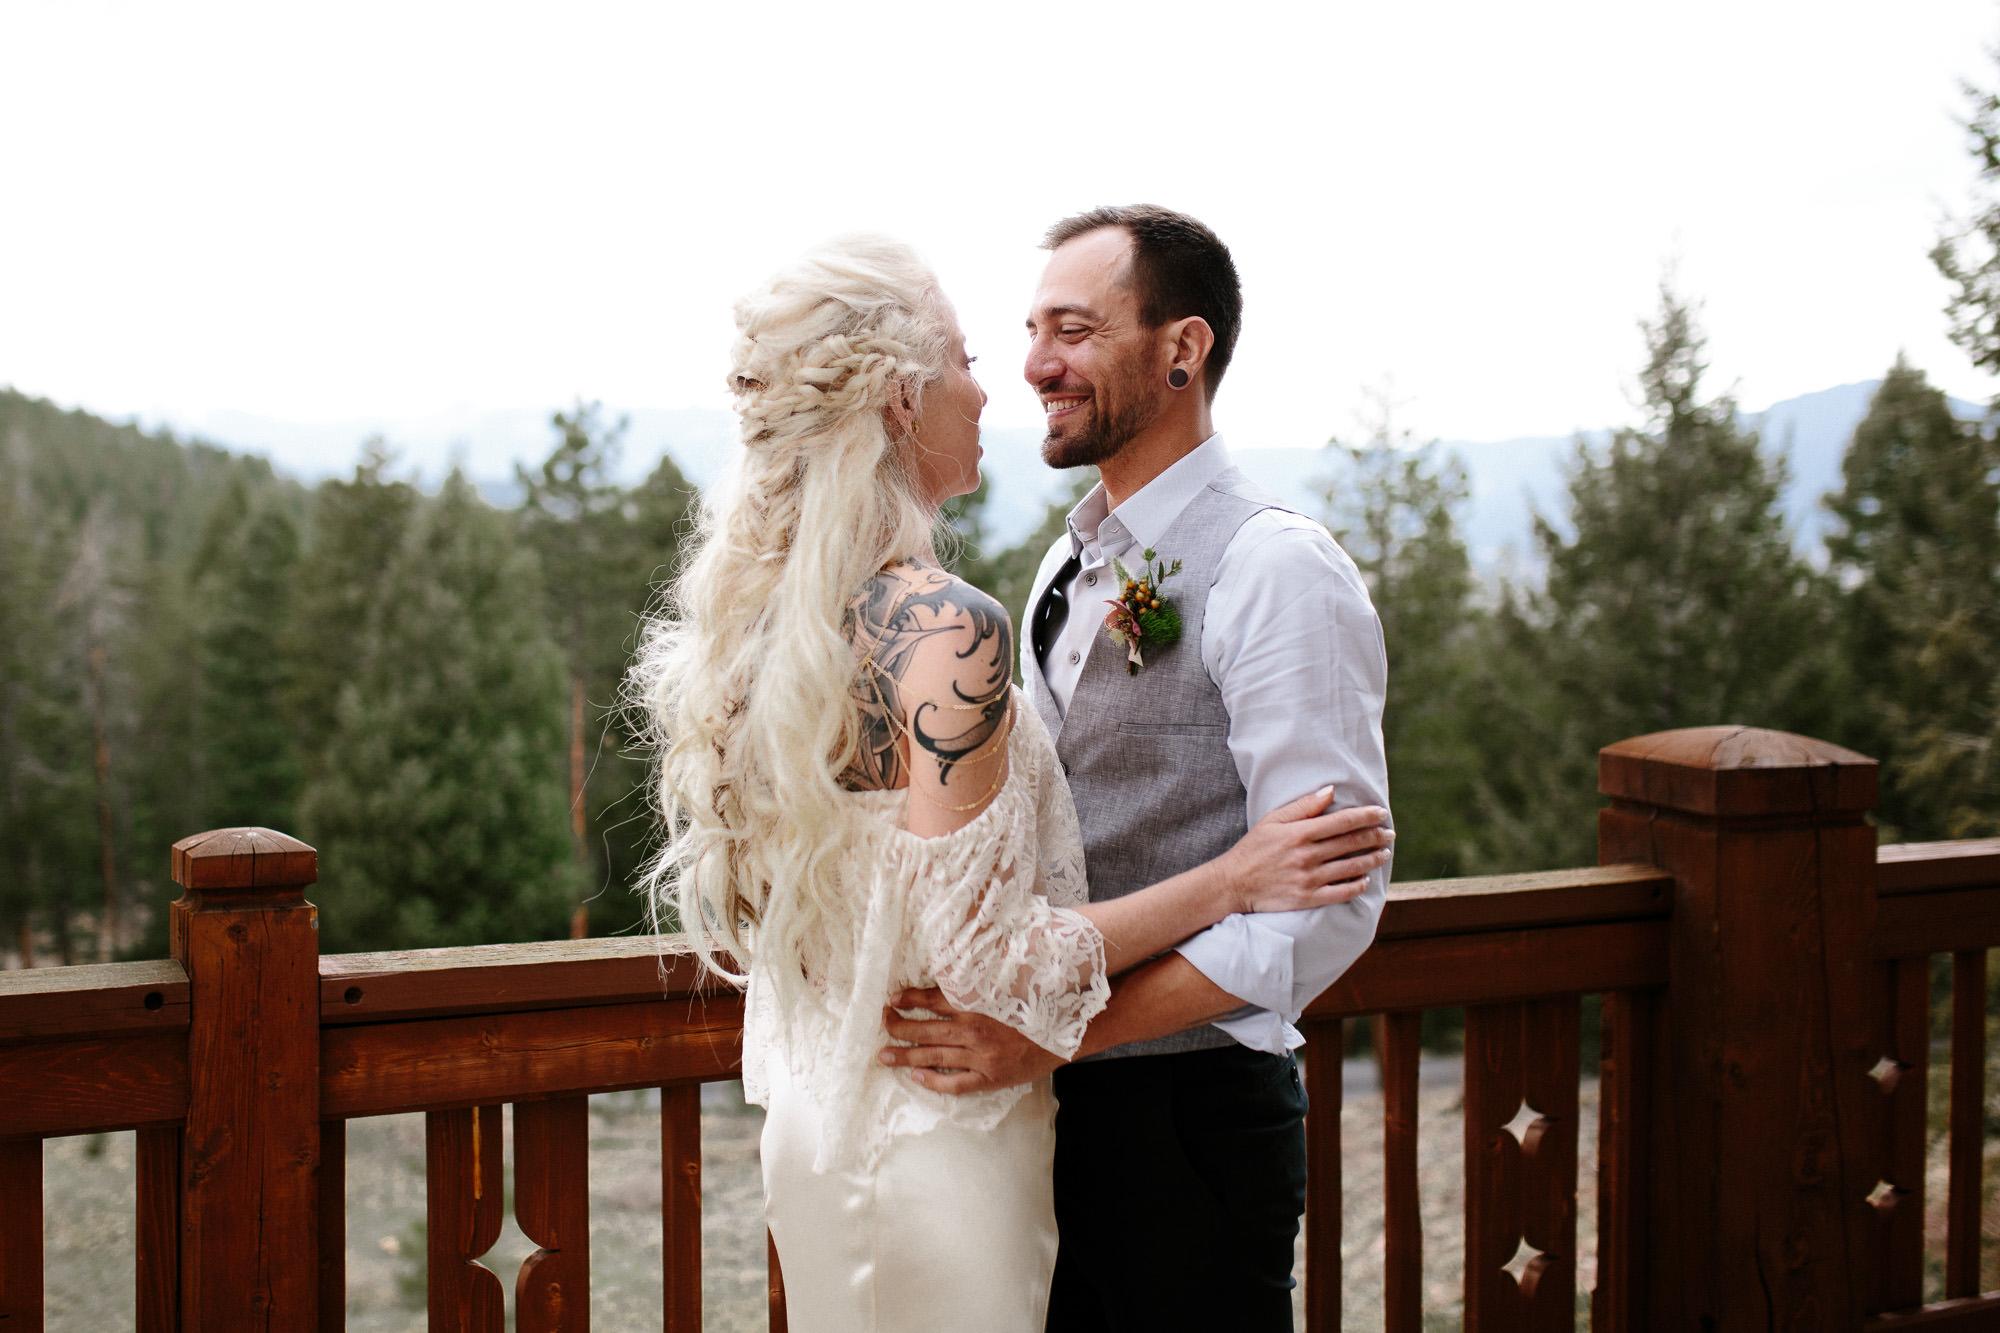 bucci-barn-wedding-elopement-evergreen-boulder-denver-colorado-adventerous-romantic-timeless-038.jpg